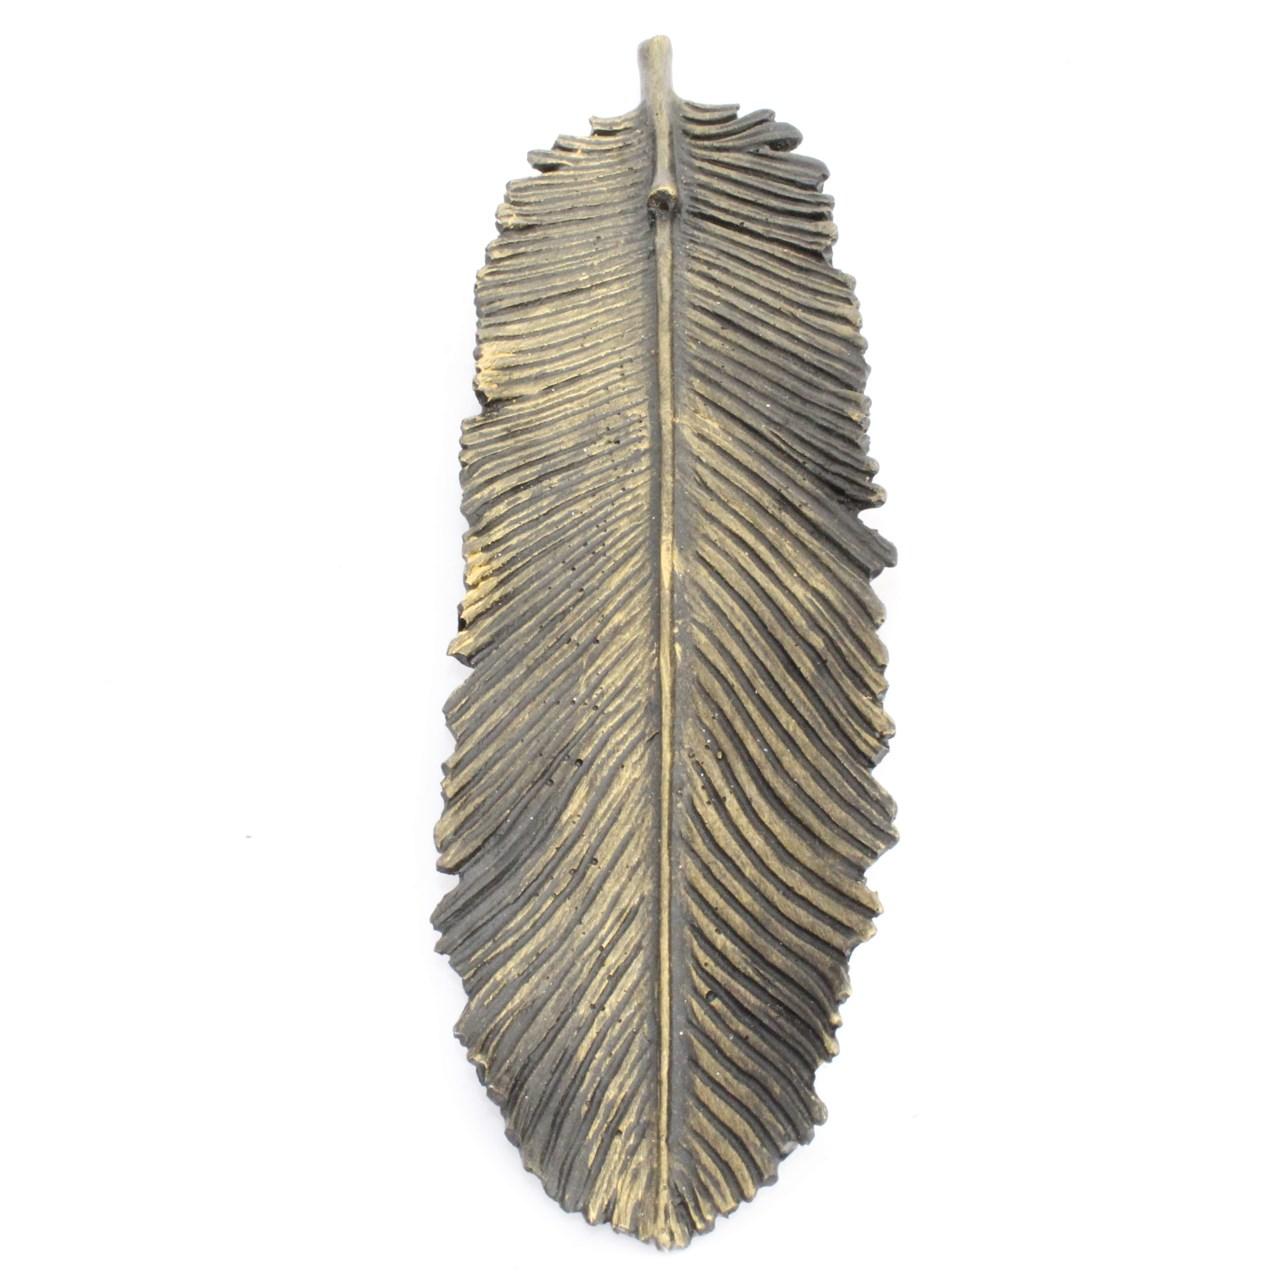 جا عودی نقطه مدل Feather